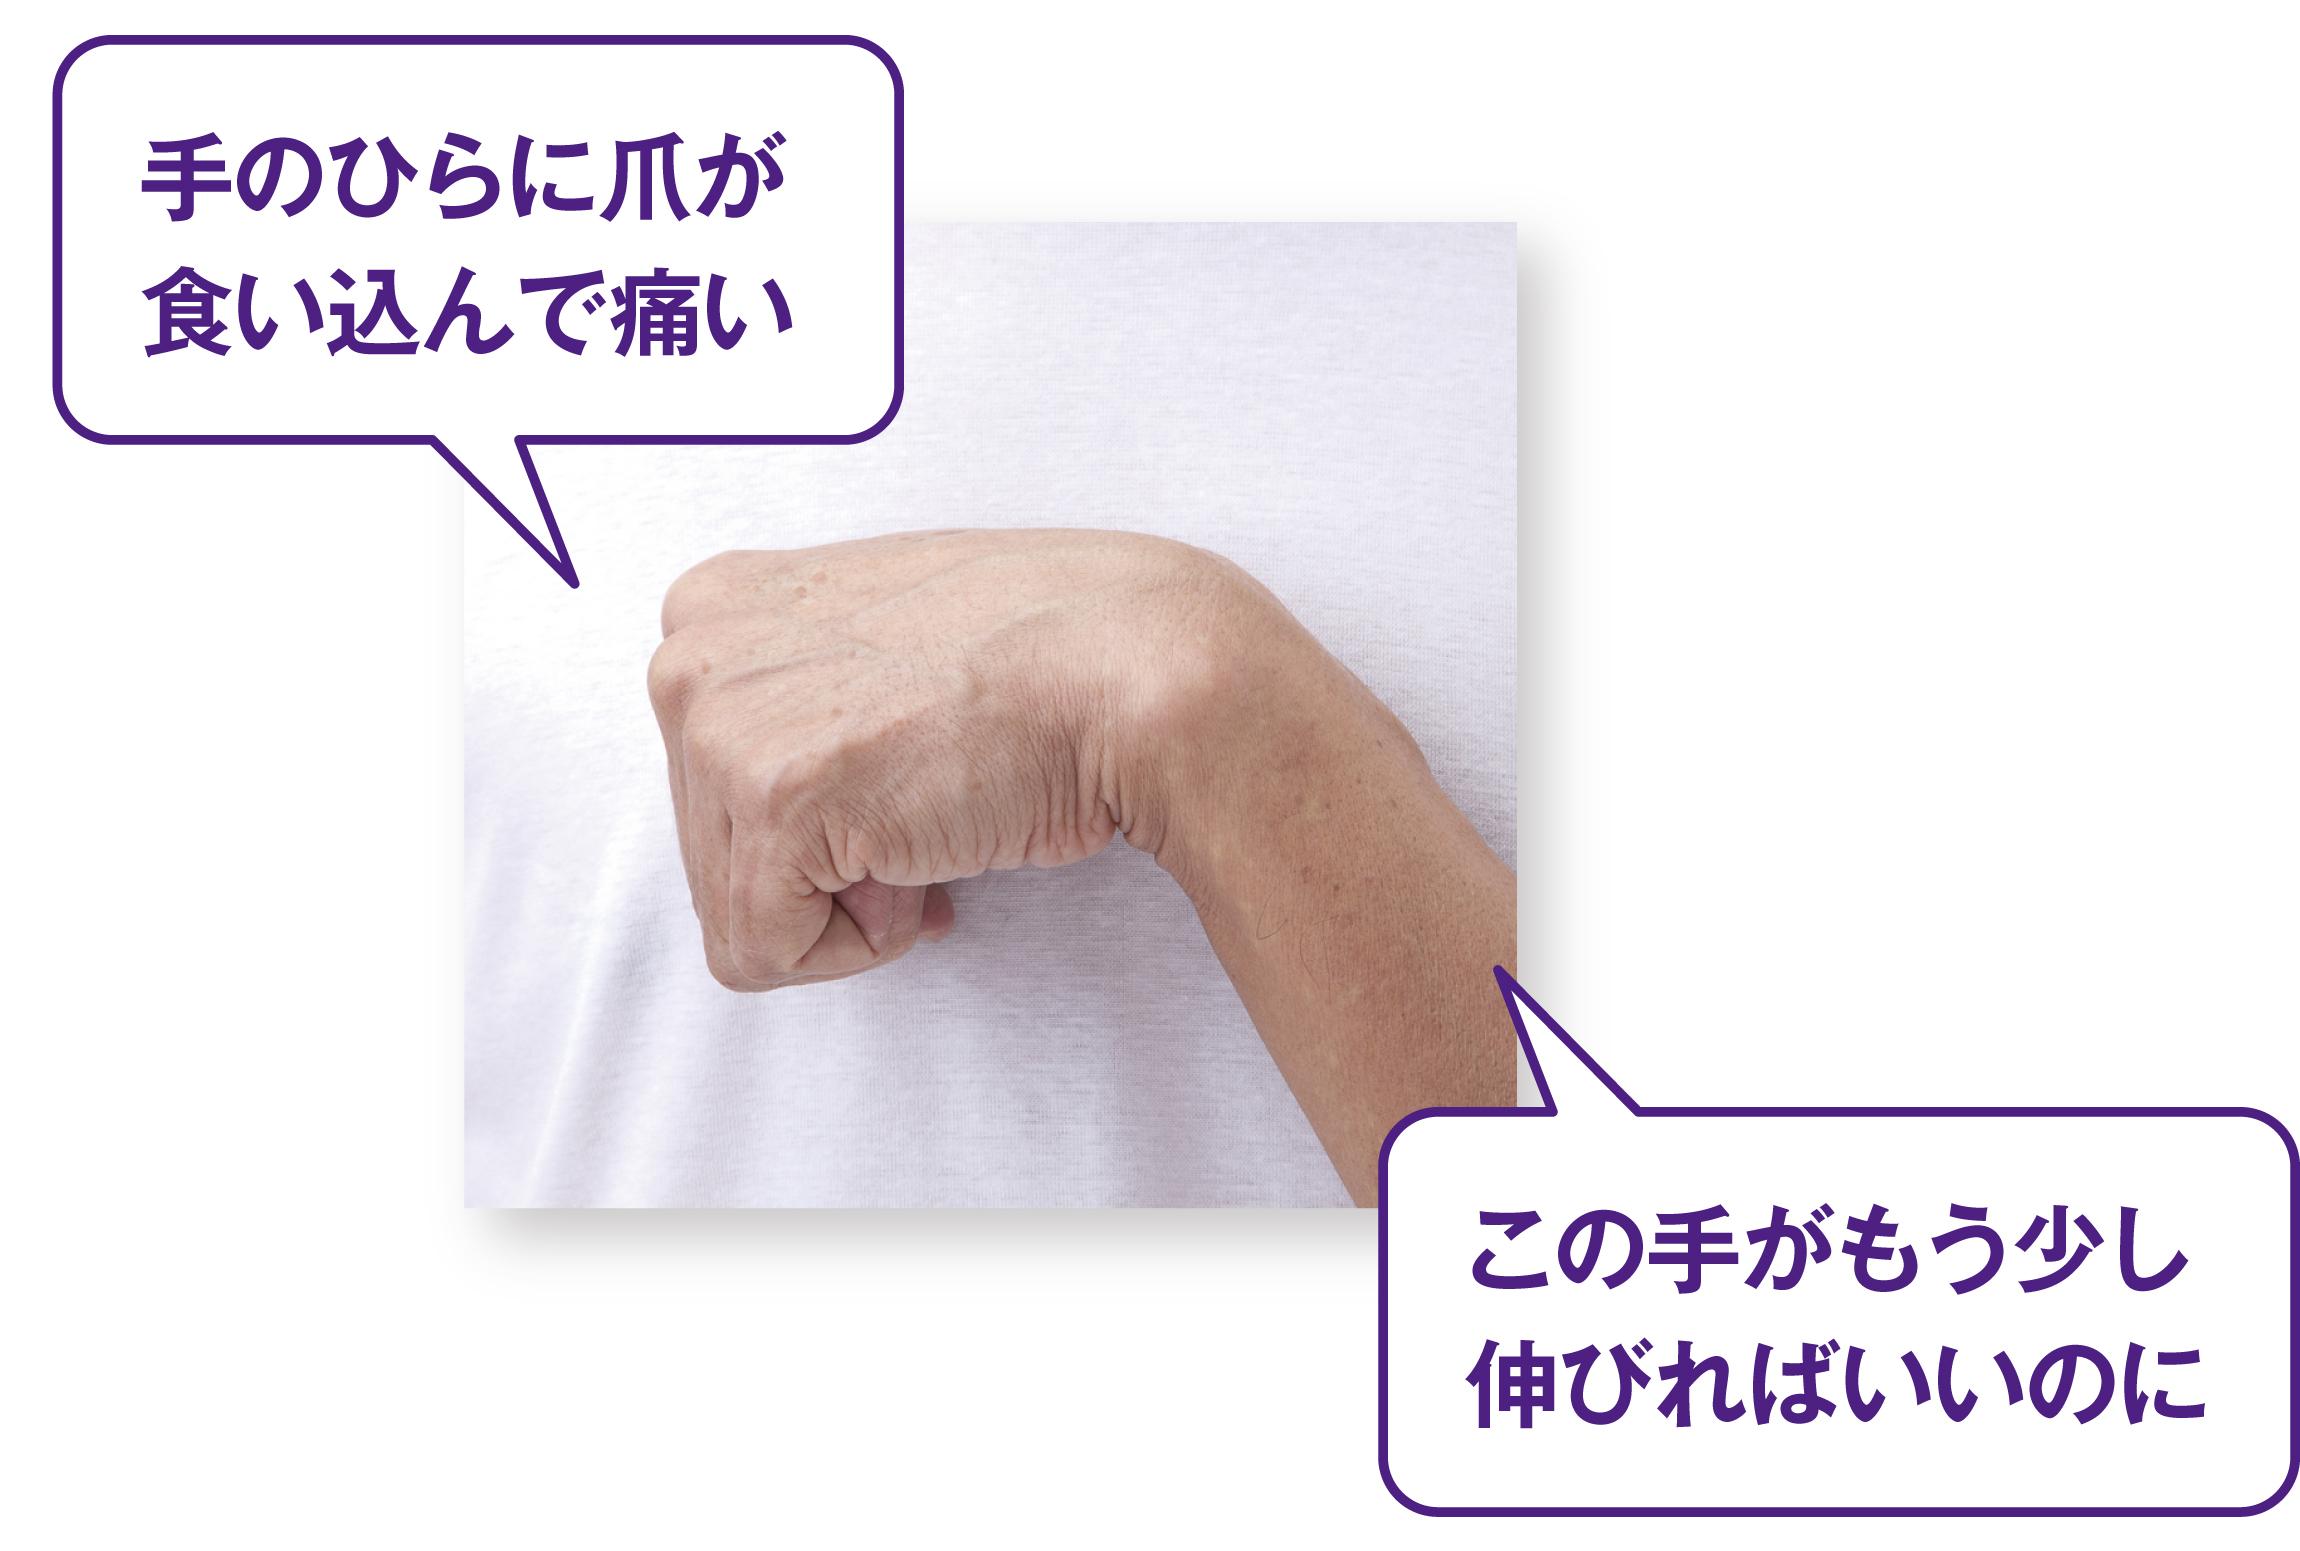 image1-RH-Sinkei